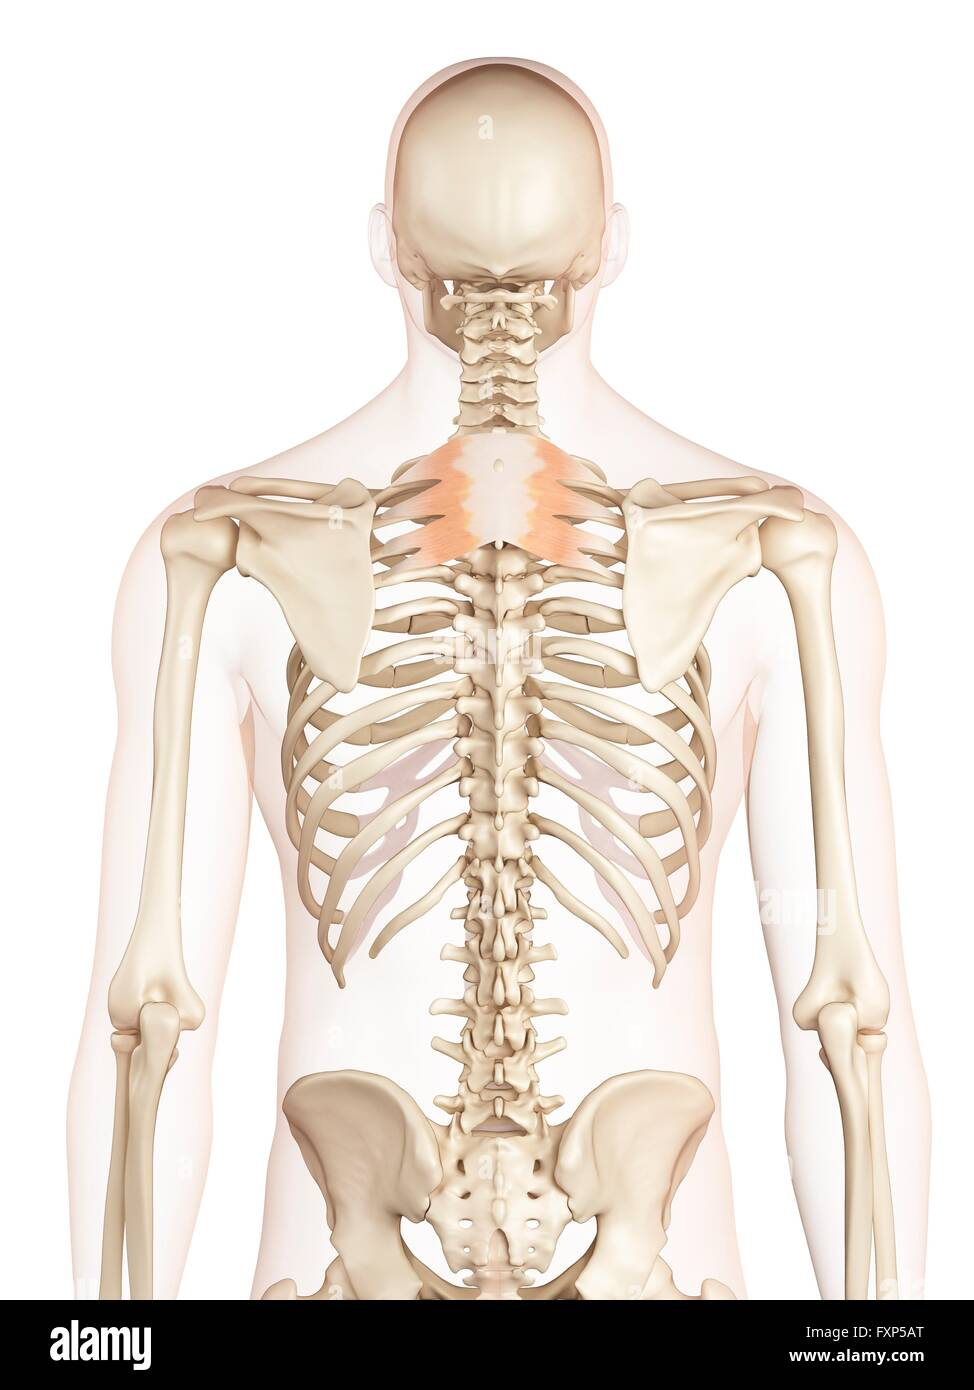 Muscles Bones Back Stockfotos & Muscles Bones Back Bilder - Seite 2 ...